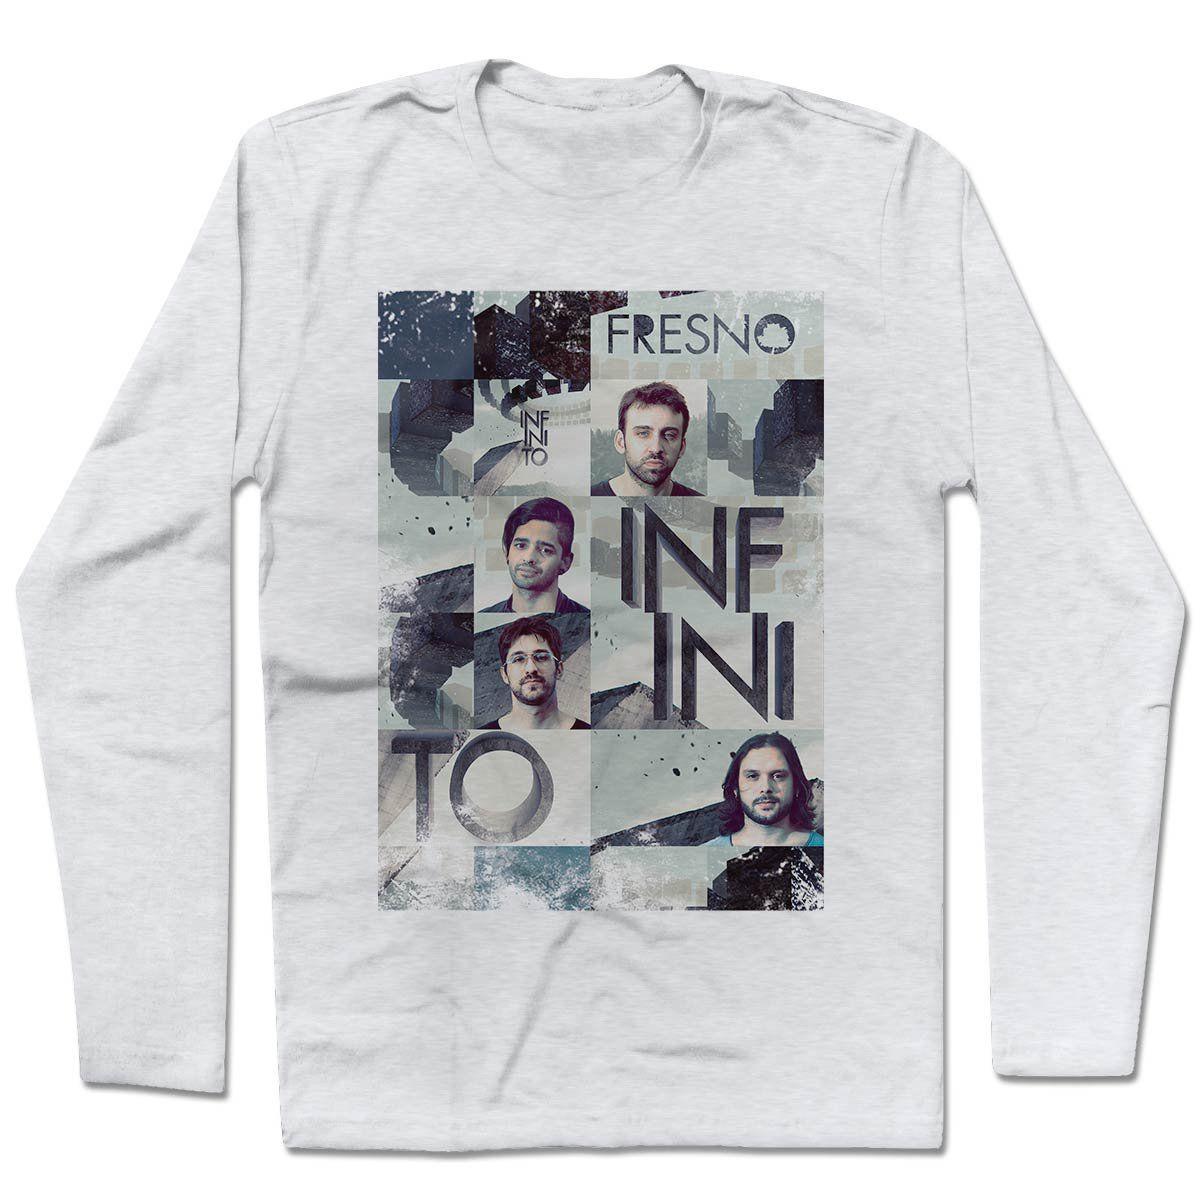 Camiseta Manga Longa Fresno - Mosaico Infinito